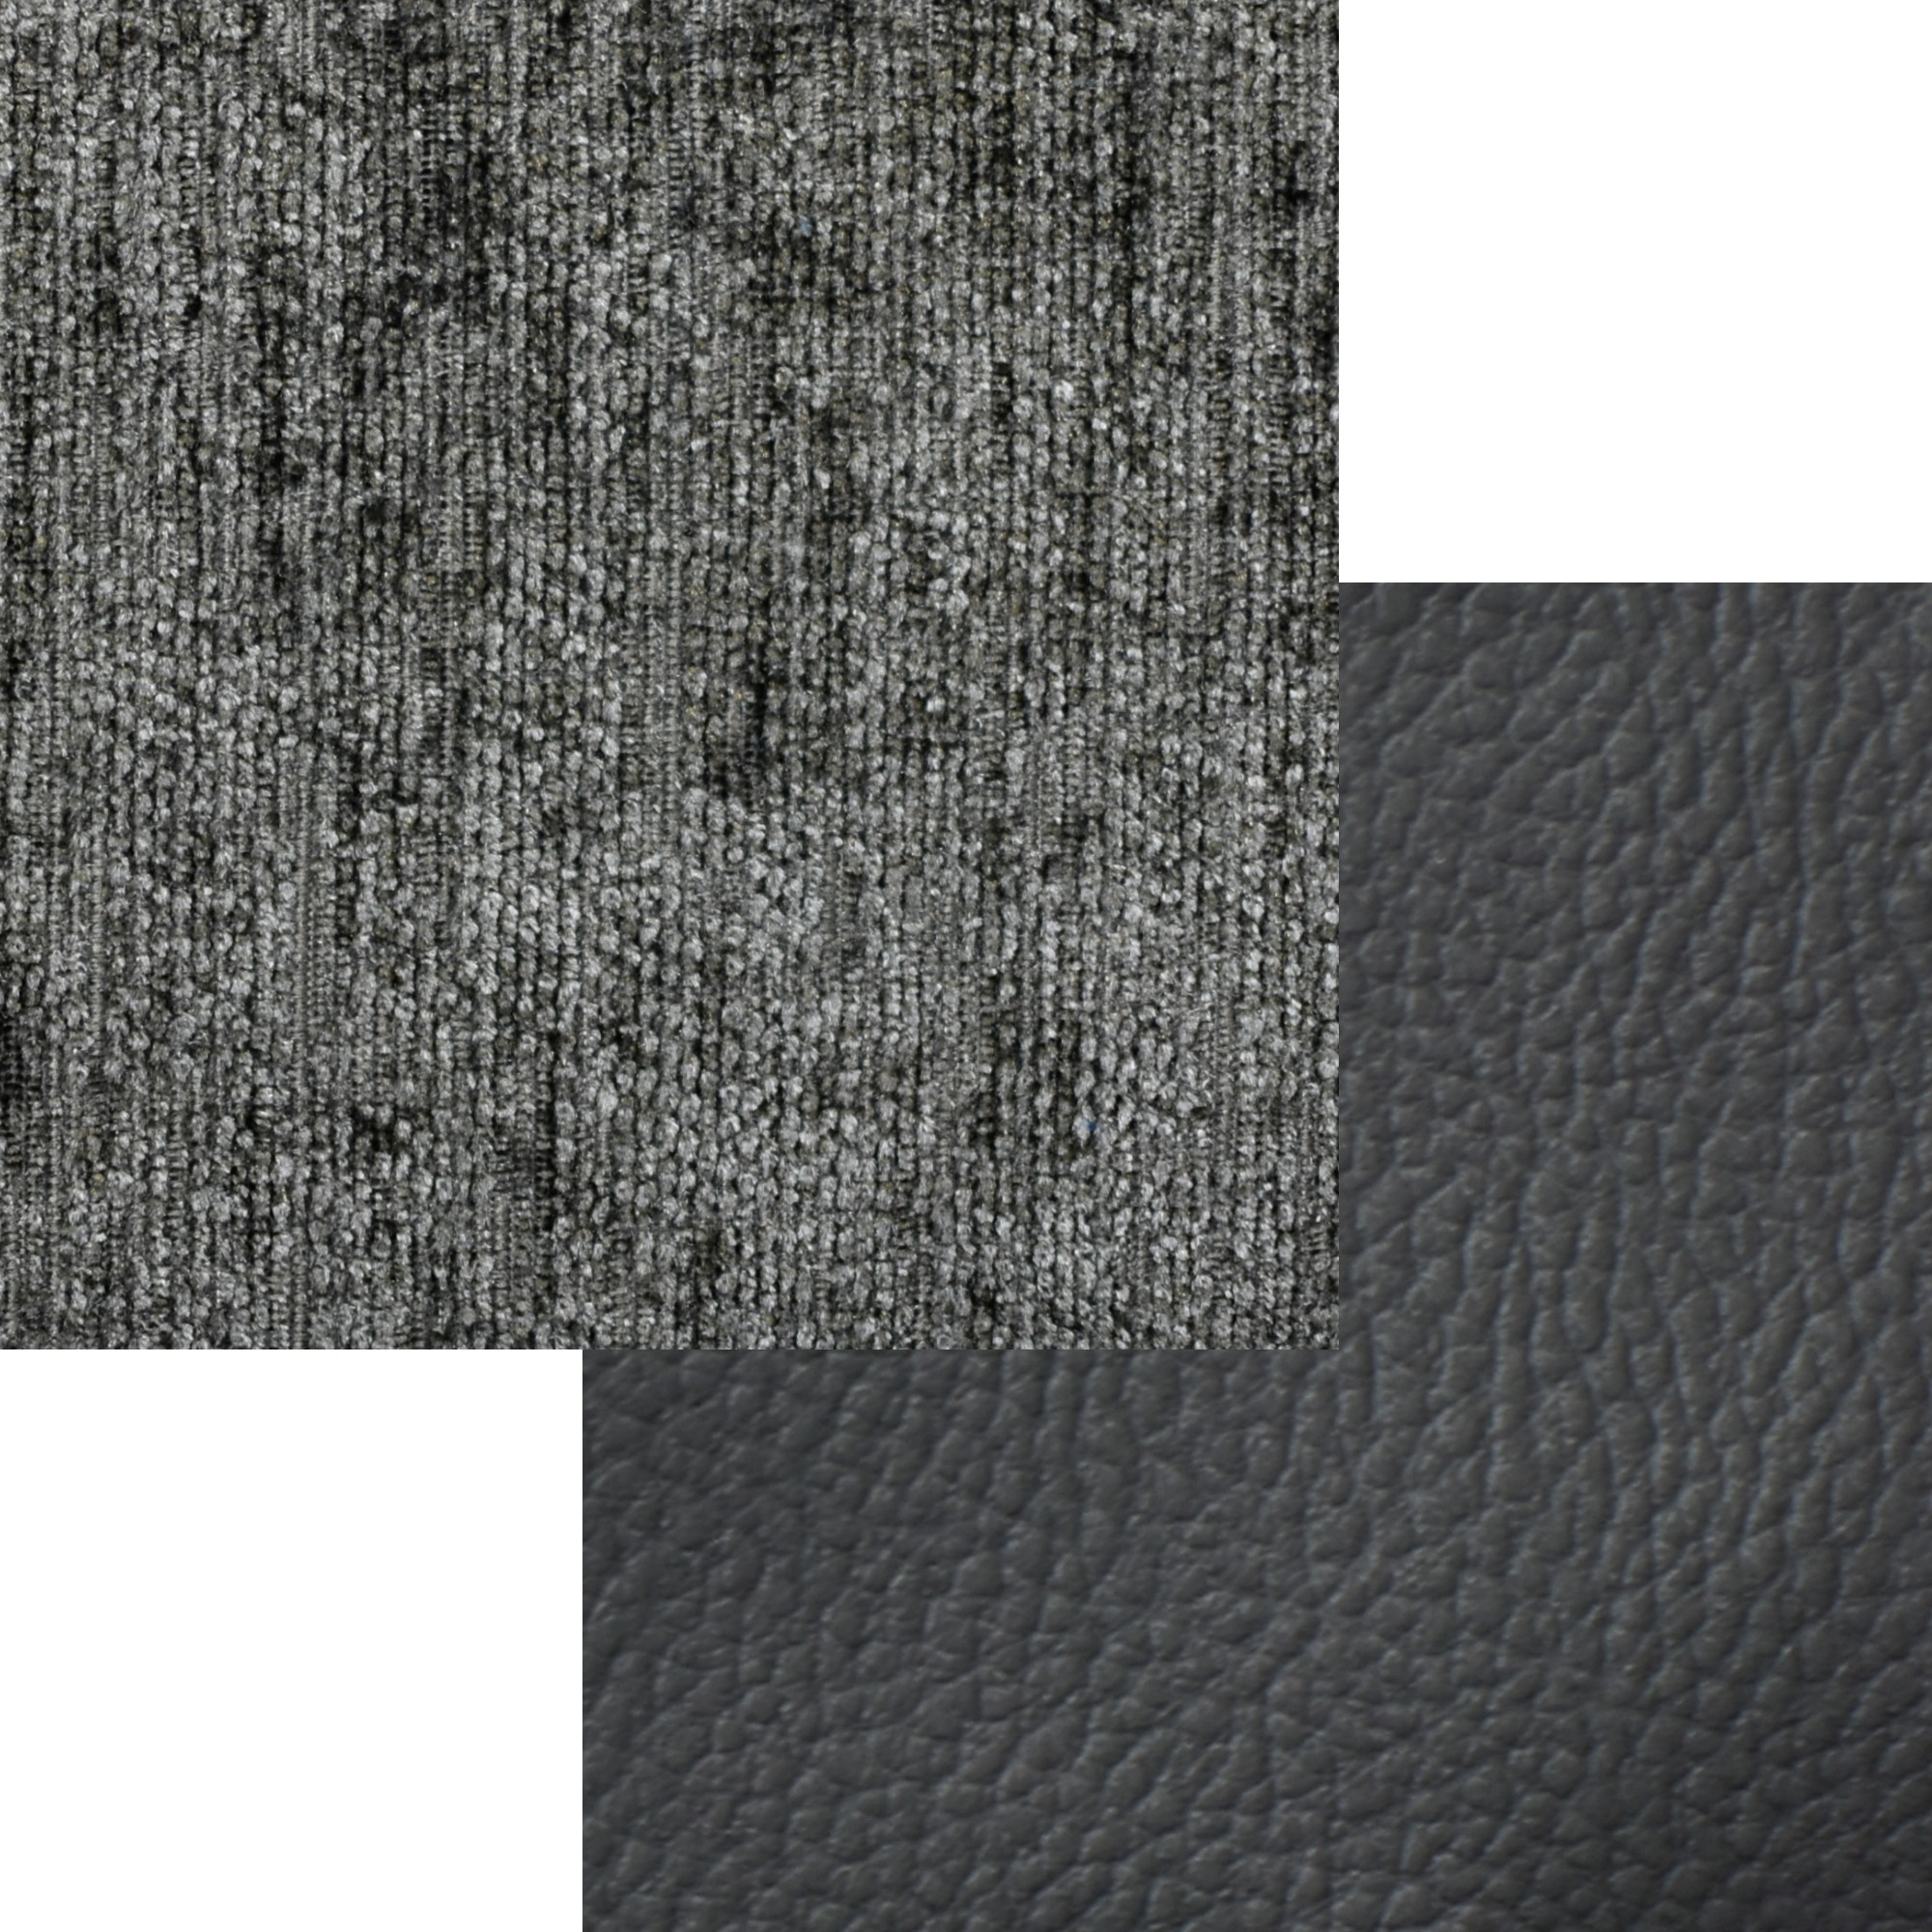 Arizona Fabric 2CR3 Left Corner Black and Grey